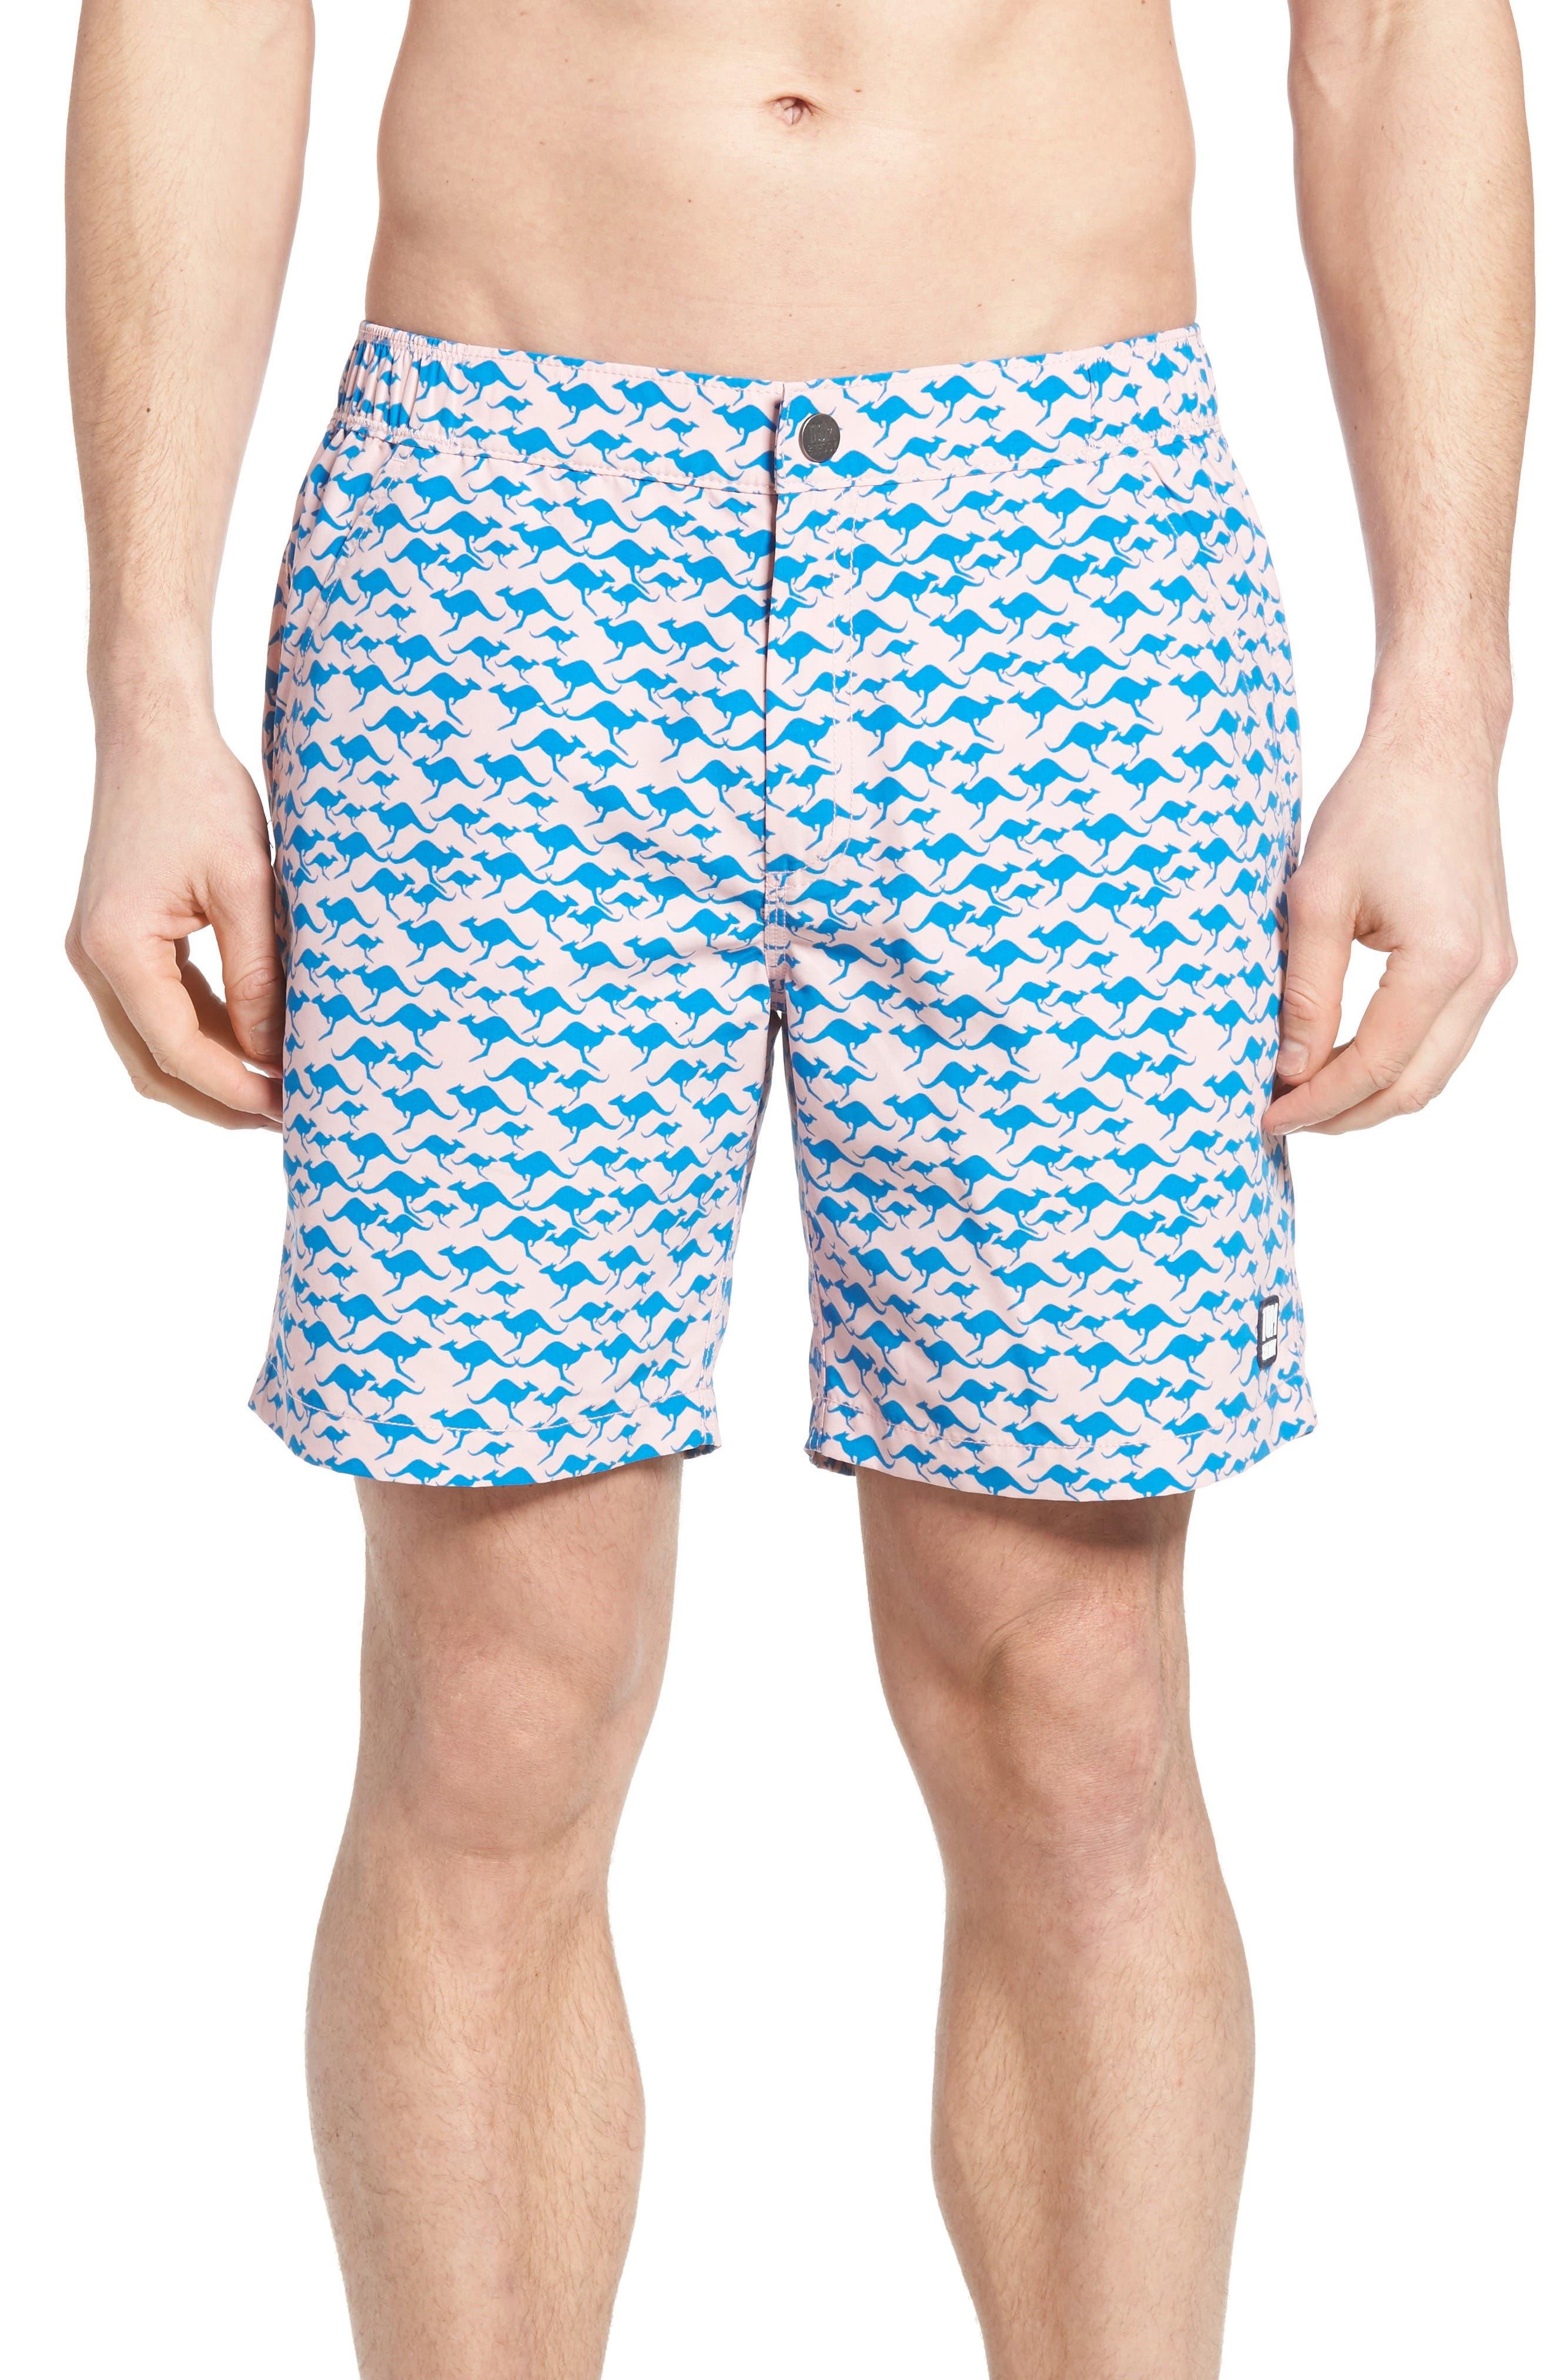 Kangaroo Print Swim Trunks,                         Main,                         color, 401